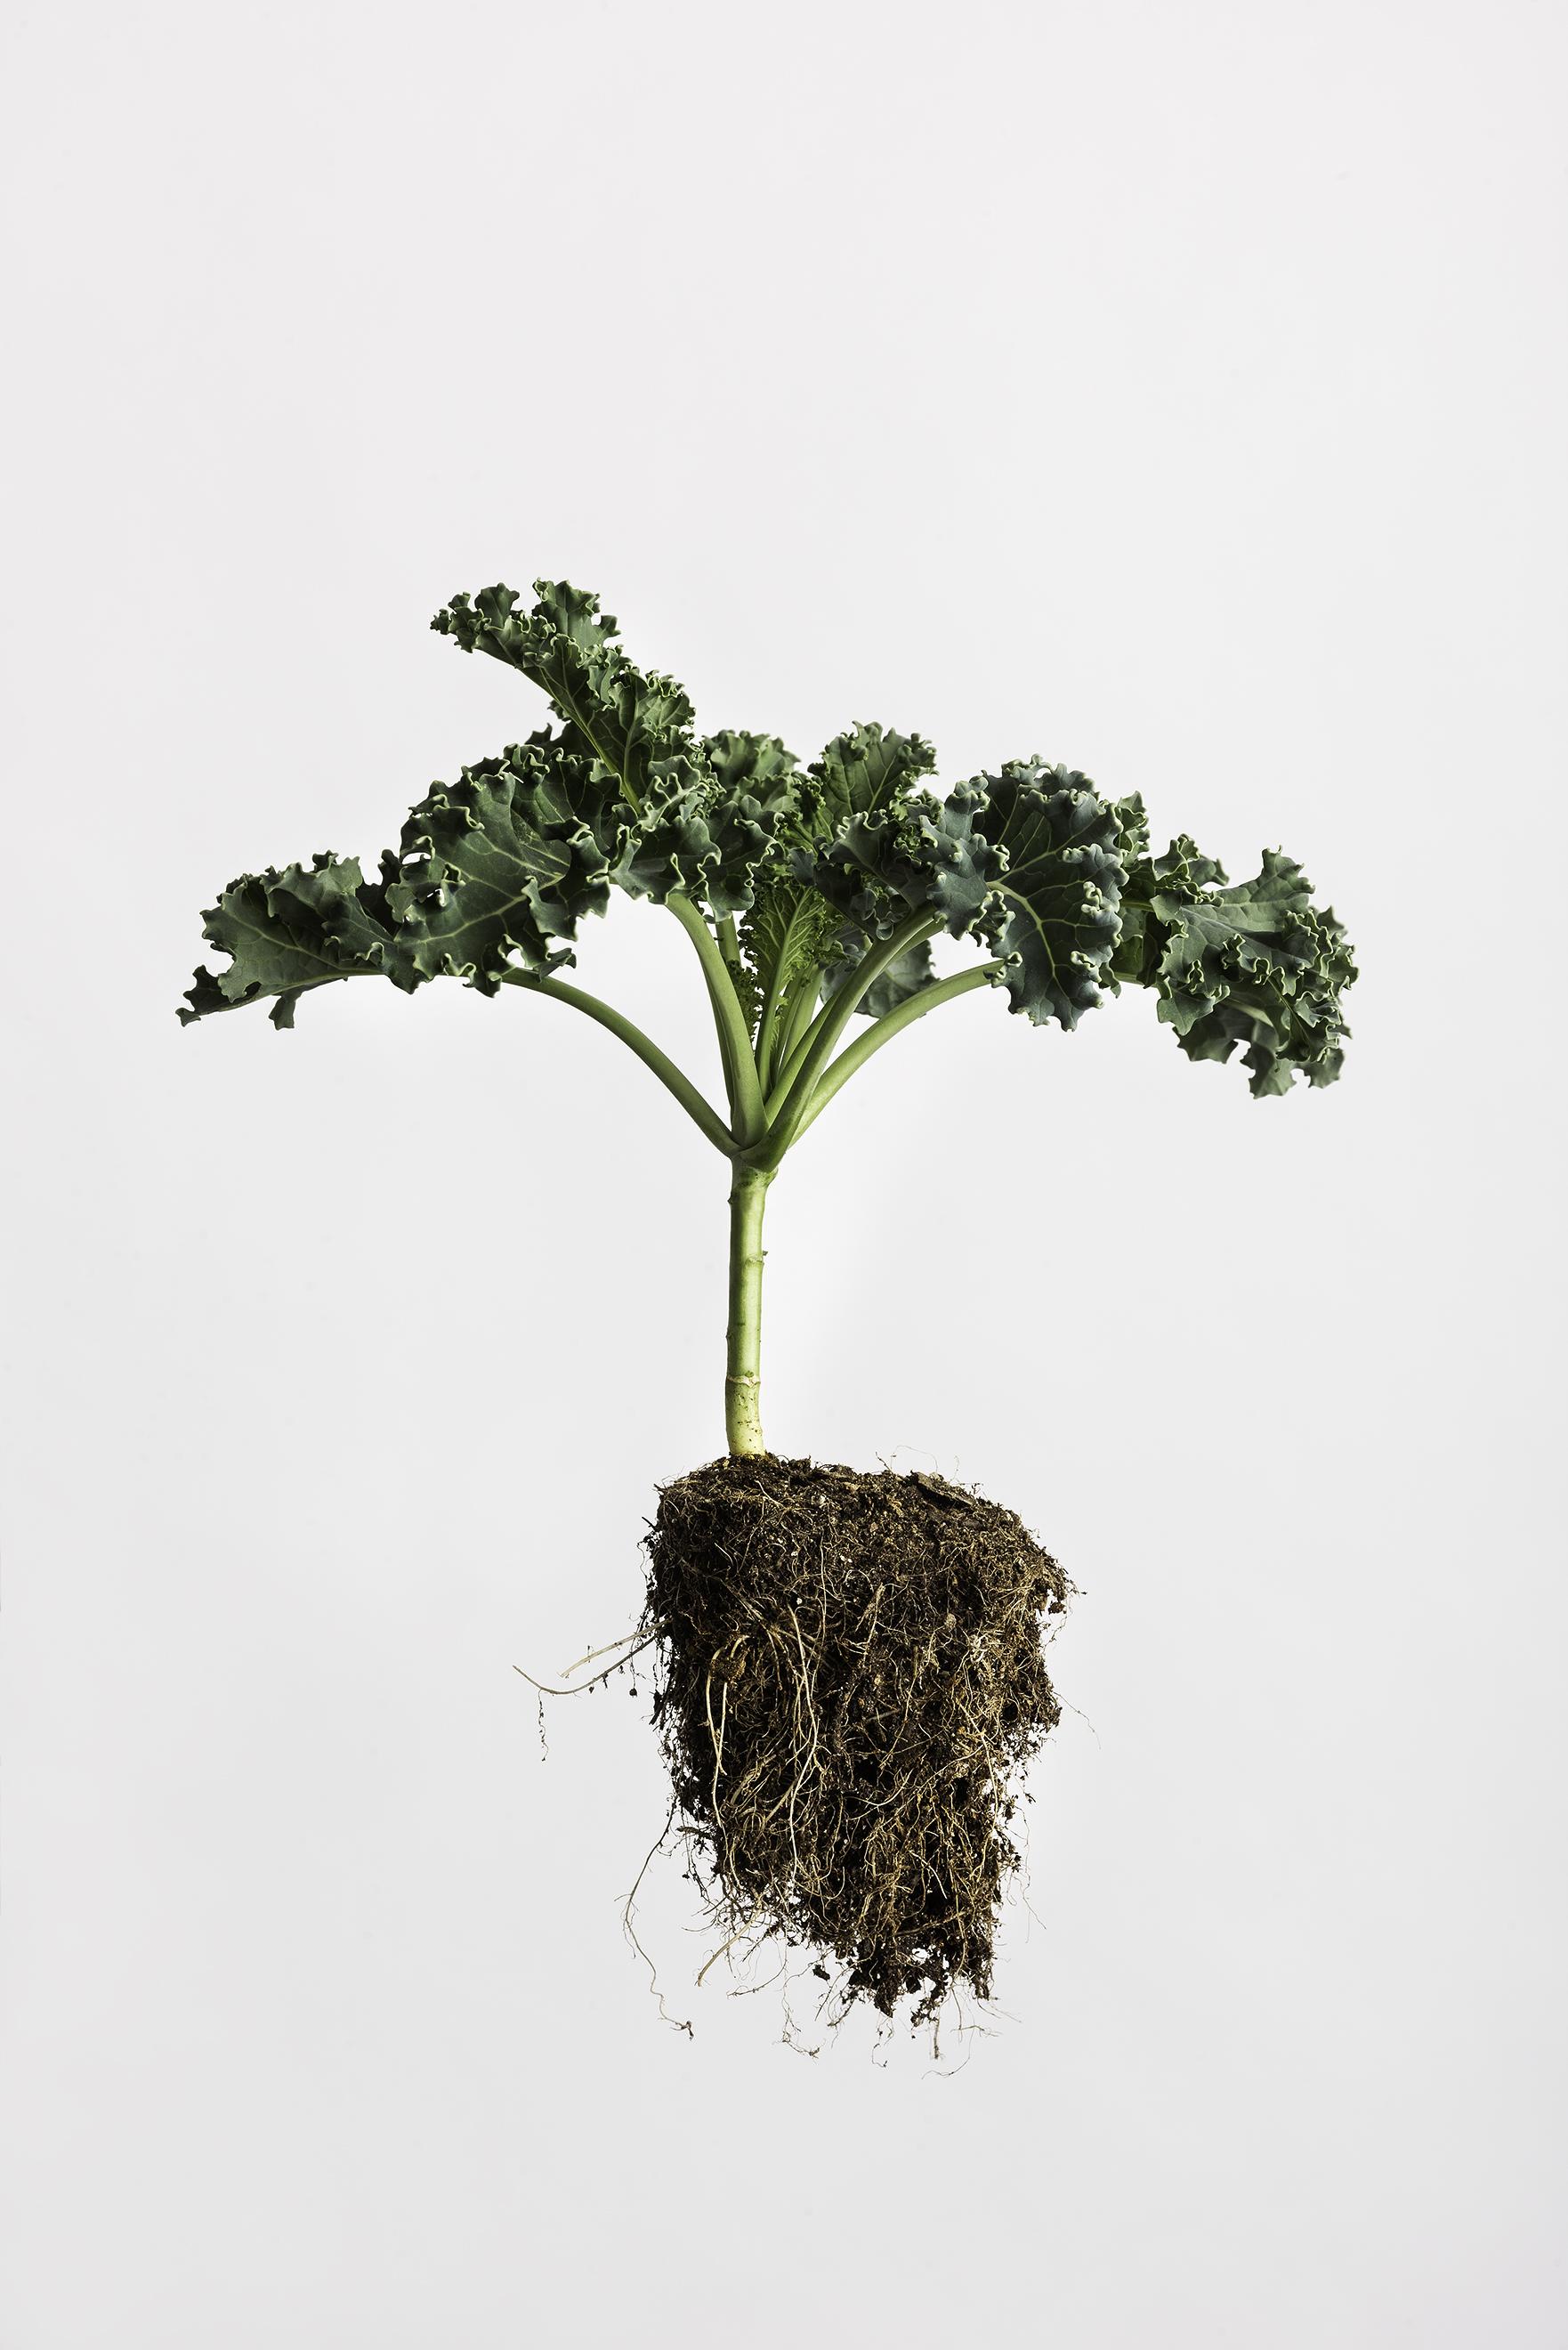 Brassica oleracea - Curly Kale